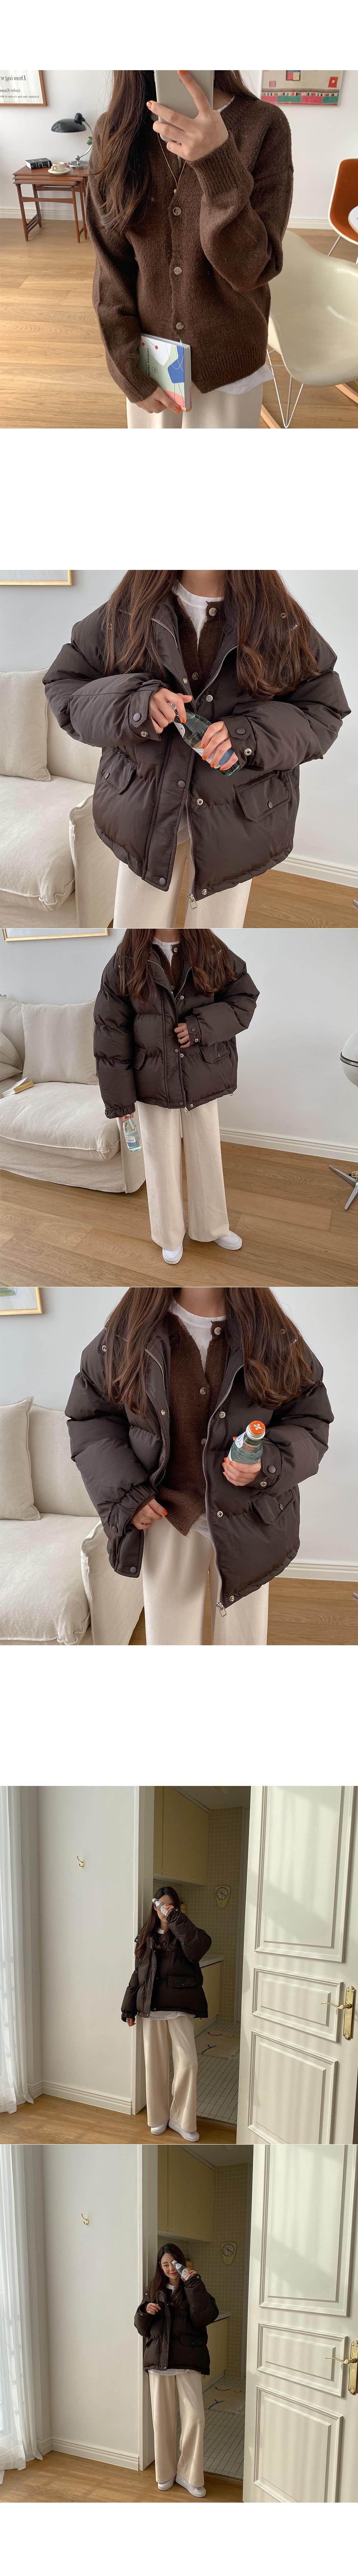 Felt round knit cardigan